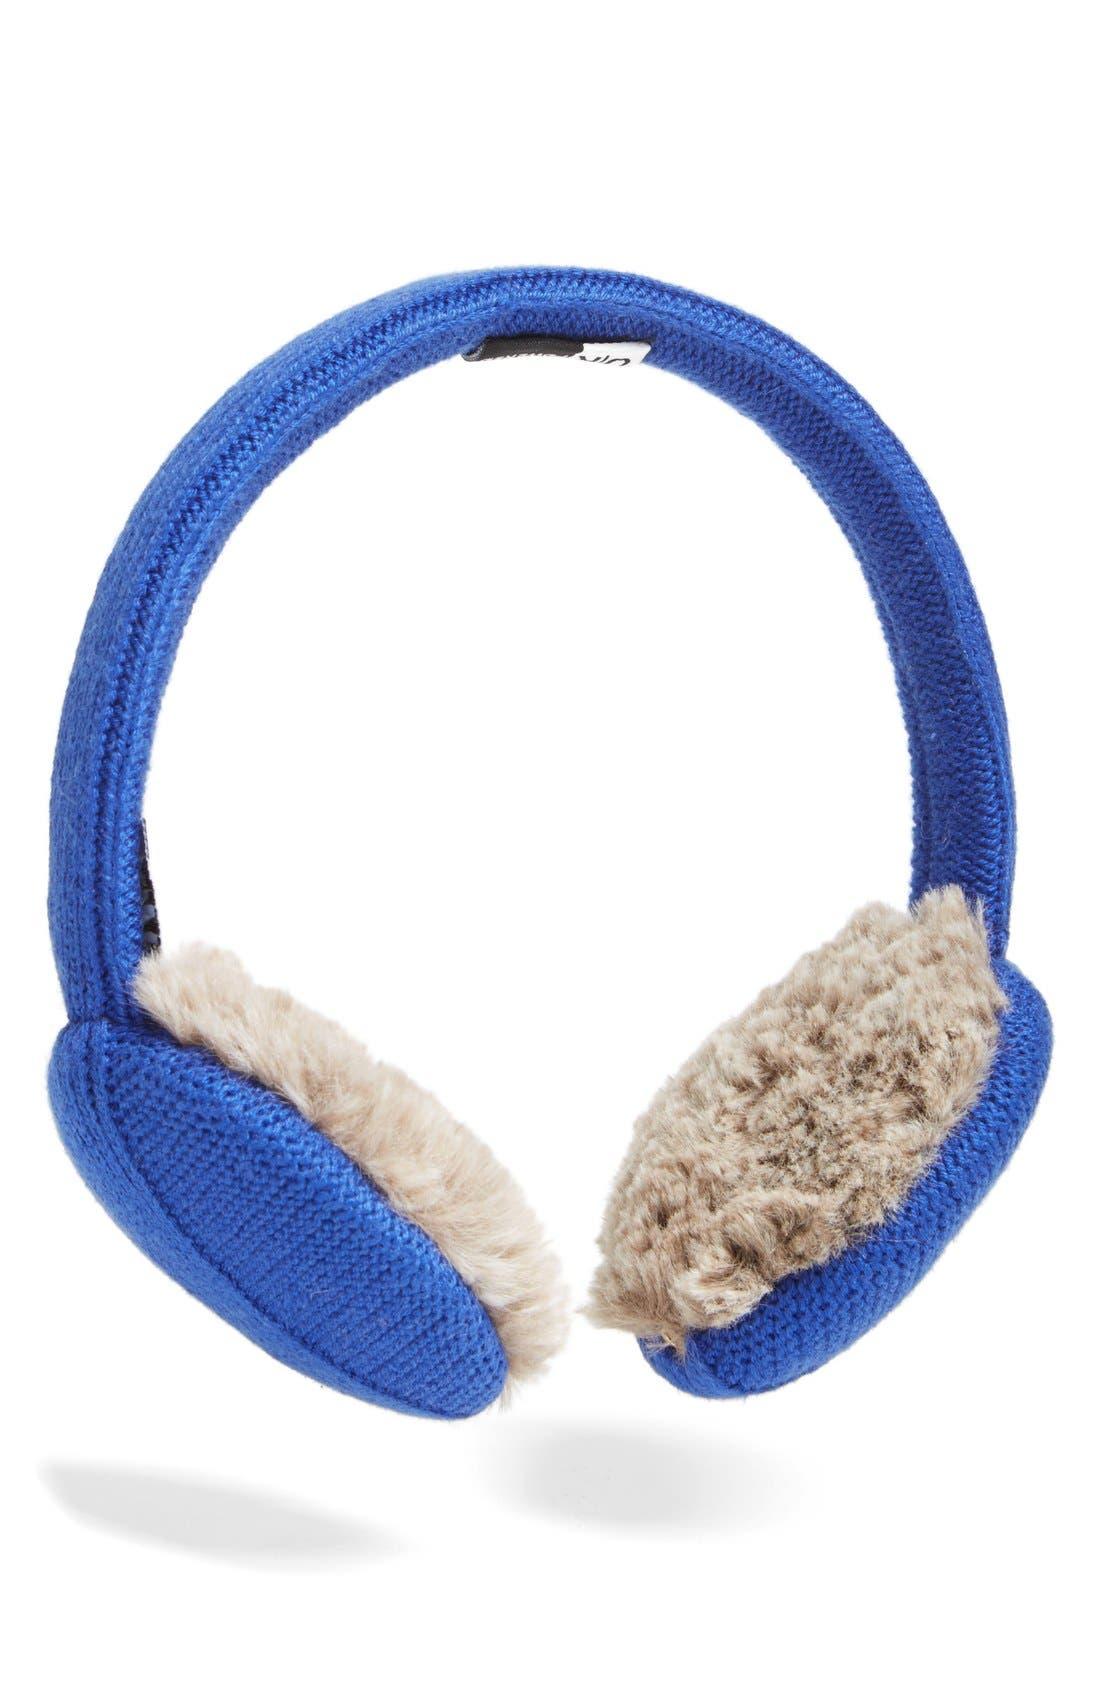 Tech Earmuffs,                         Main,                         color, Ultra